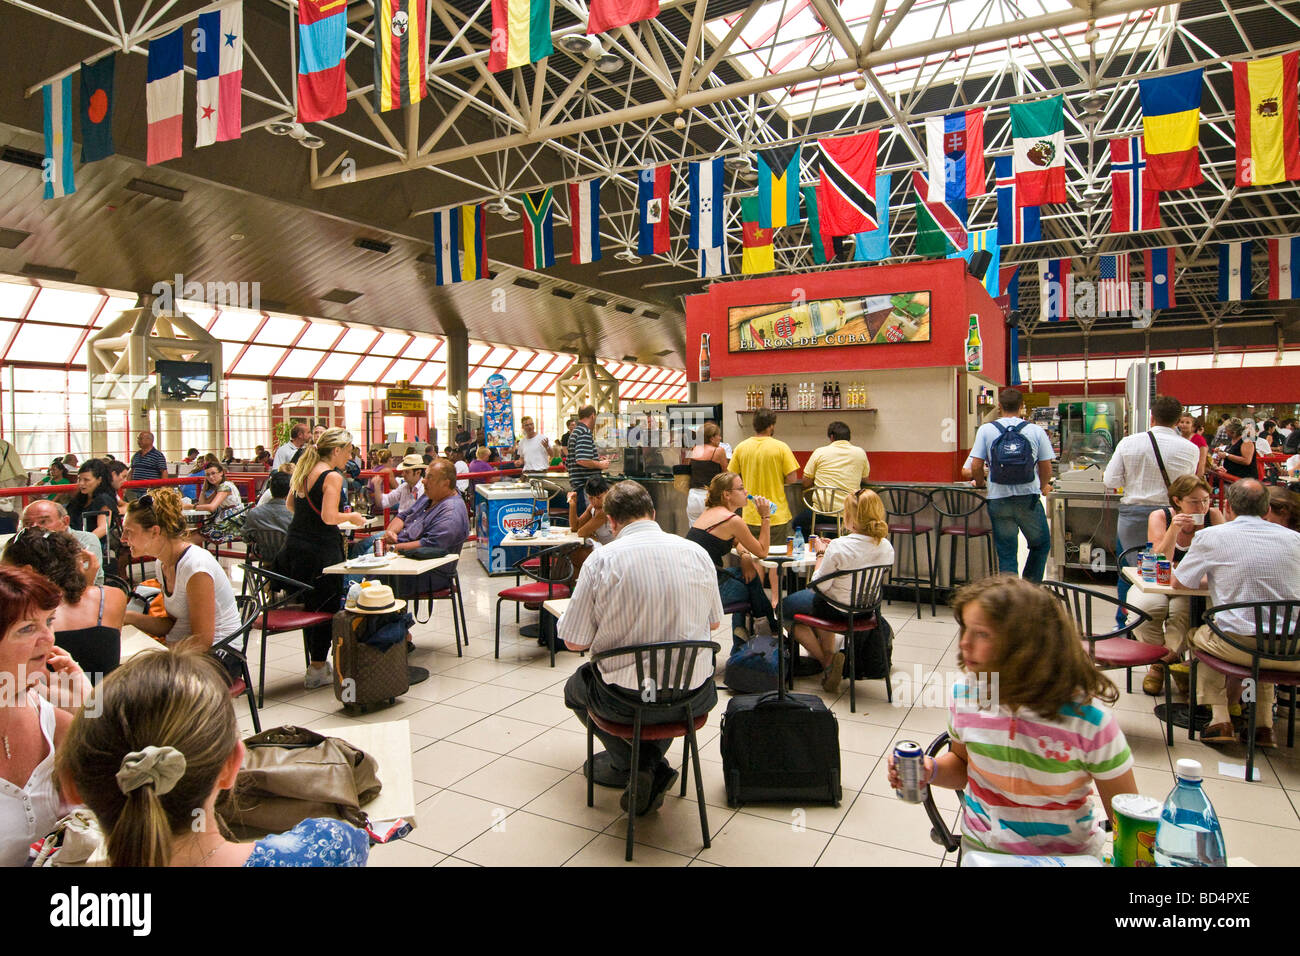 Aeroporto Havana Arrivi : Havana airport immagini havana airport fotos stock alamy